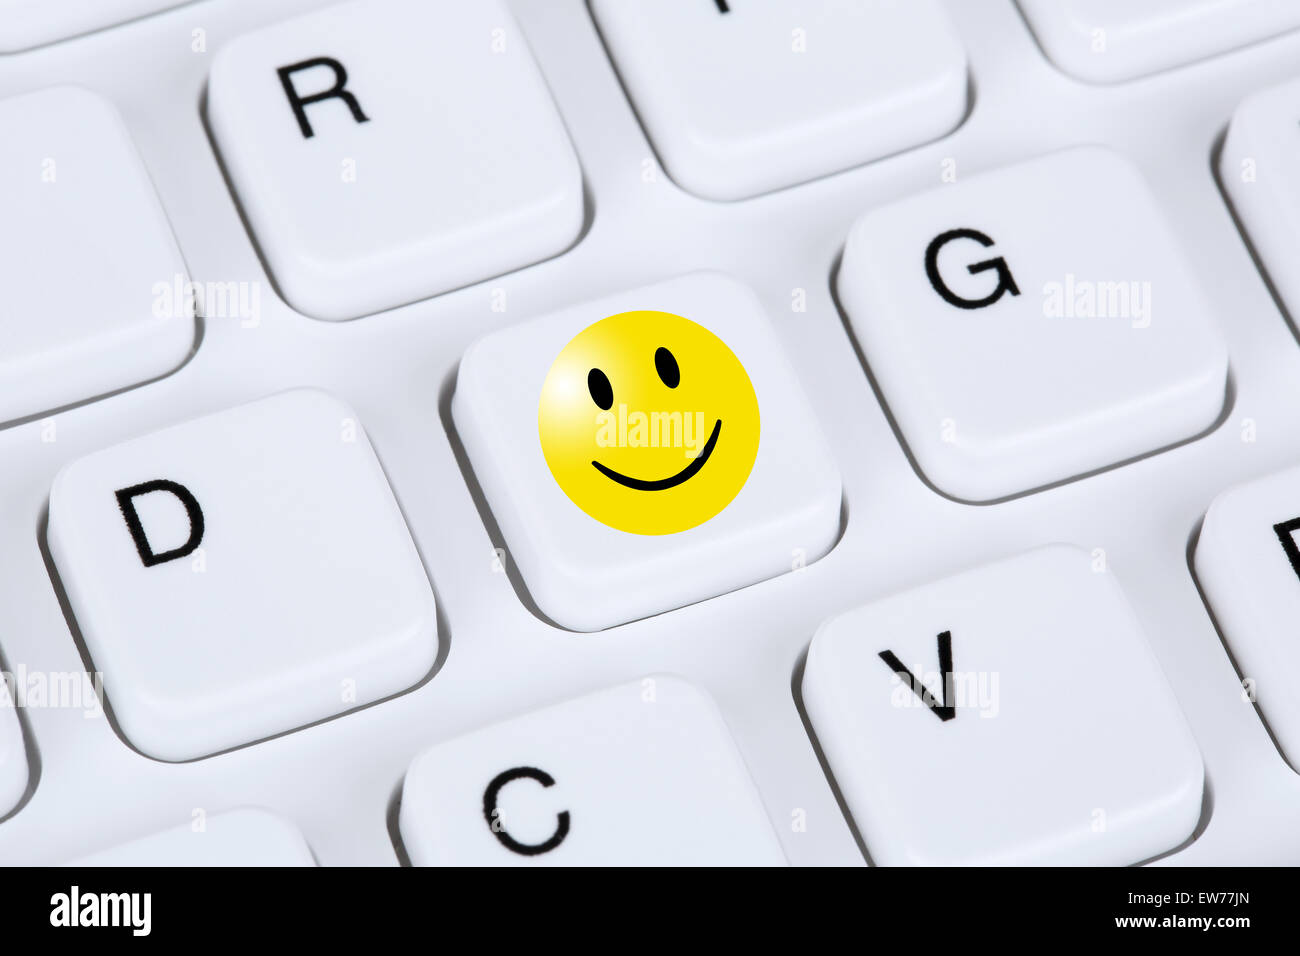 Smileys tastatur computer Keyboard layout